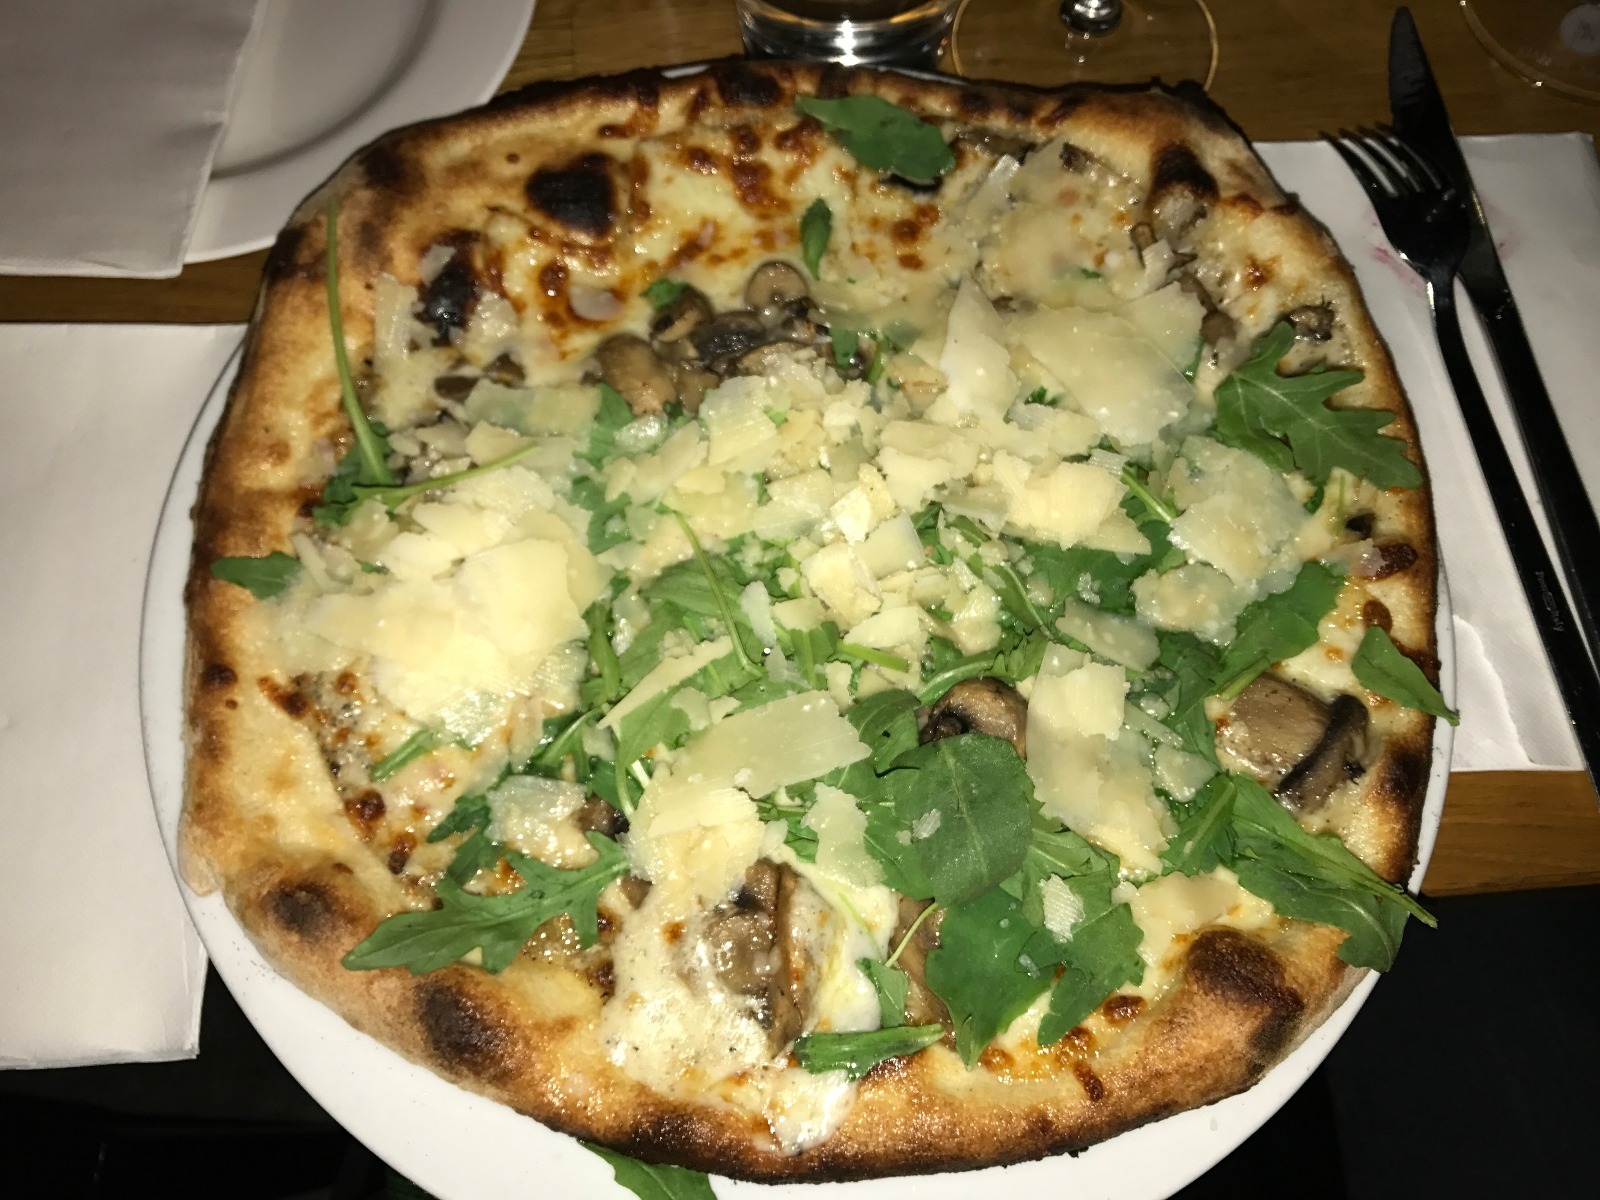 palma-mallorca-bonnes-adresses-restaurant-cocco-pizza